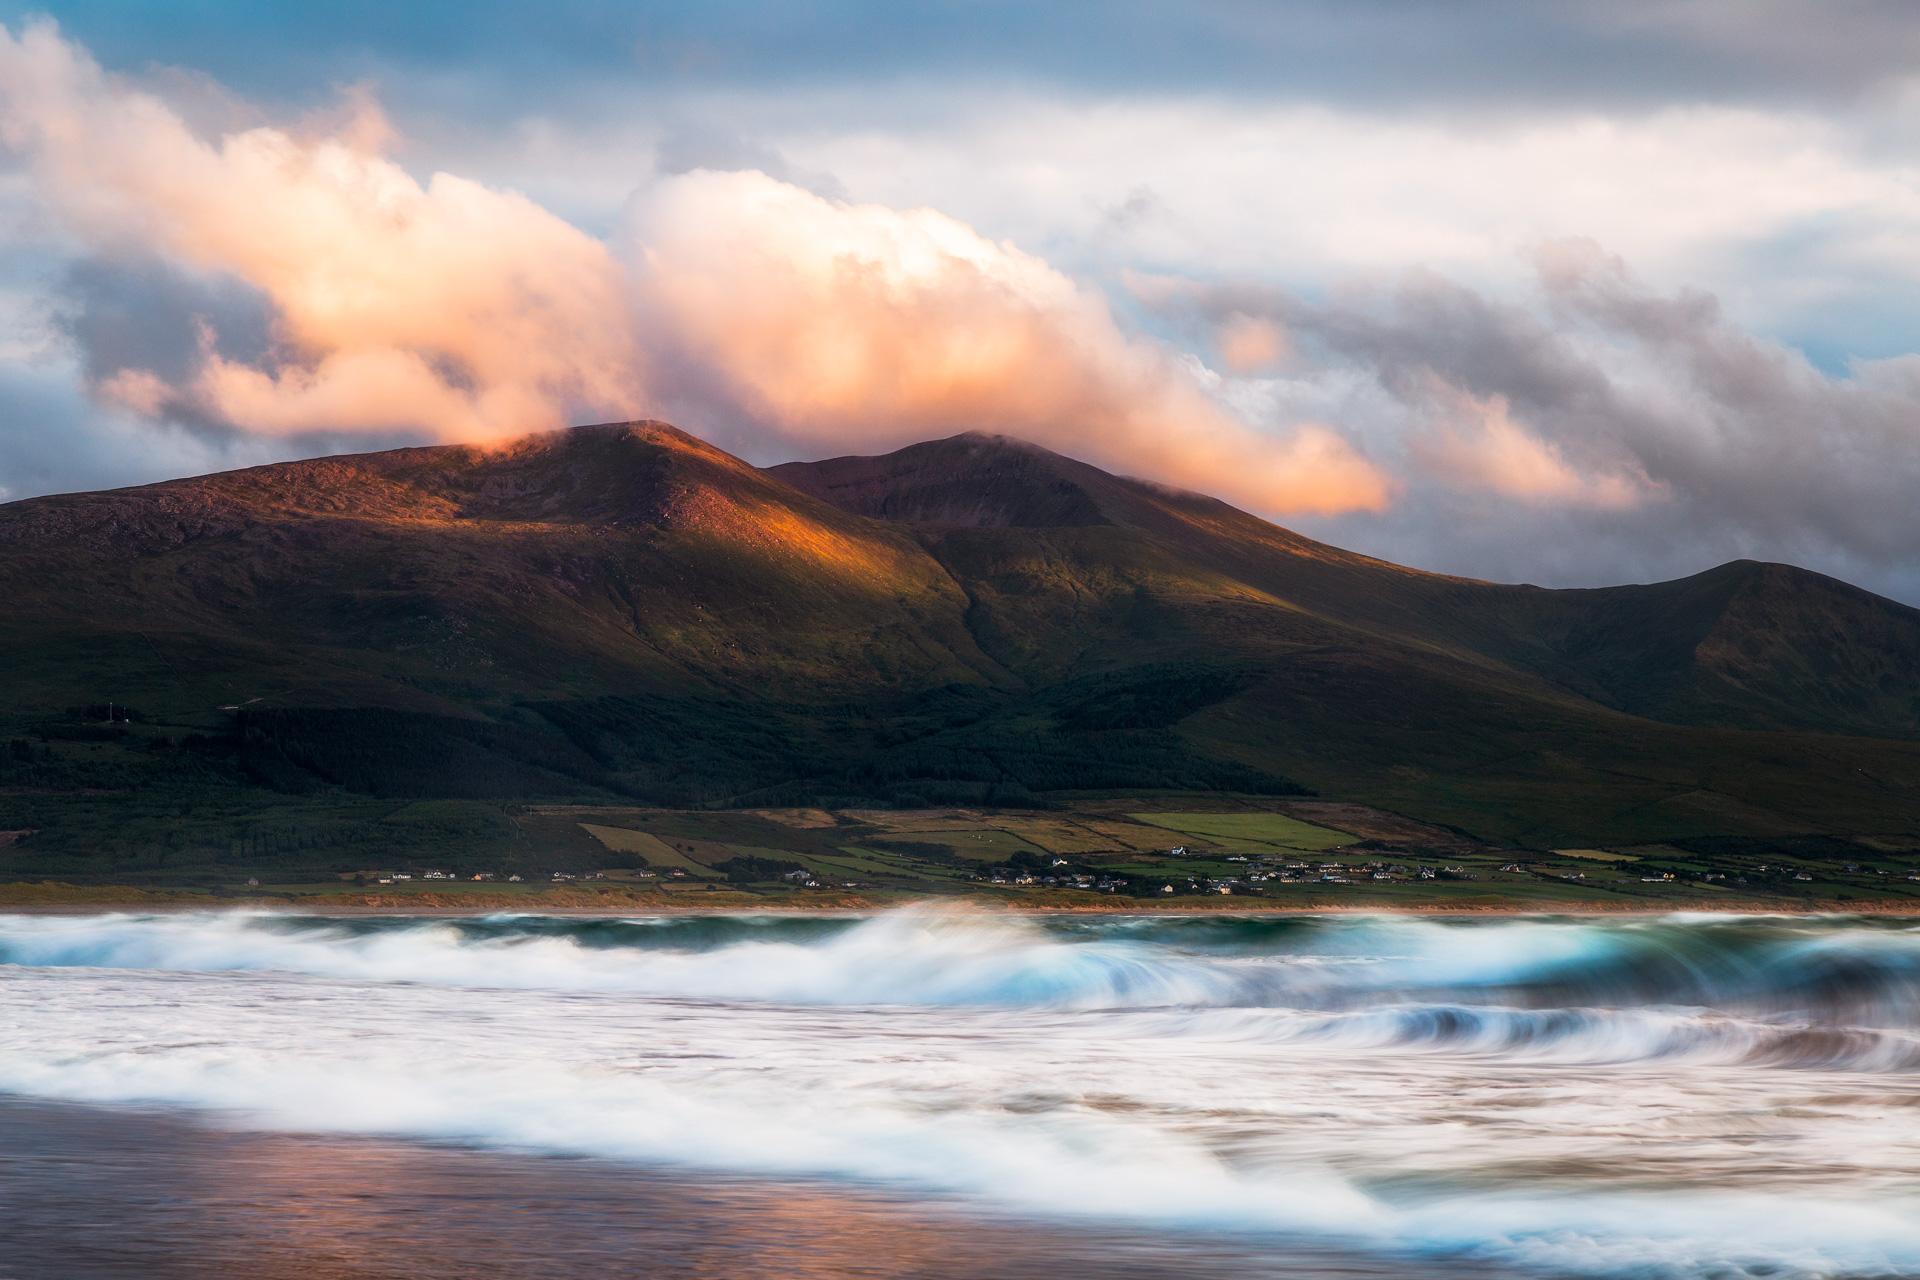 landscape_photography_castlegregory_kerry_ireland_by_greengraf_photography.jpg